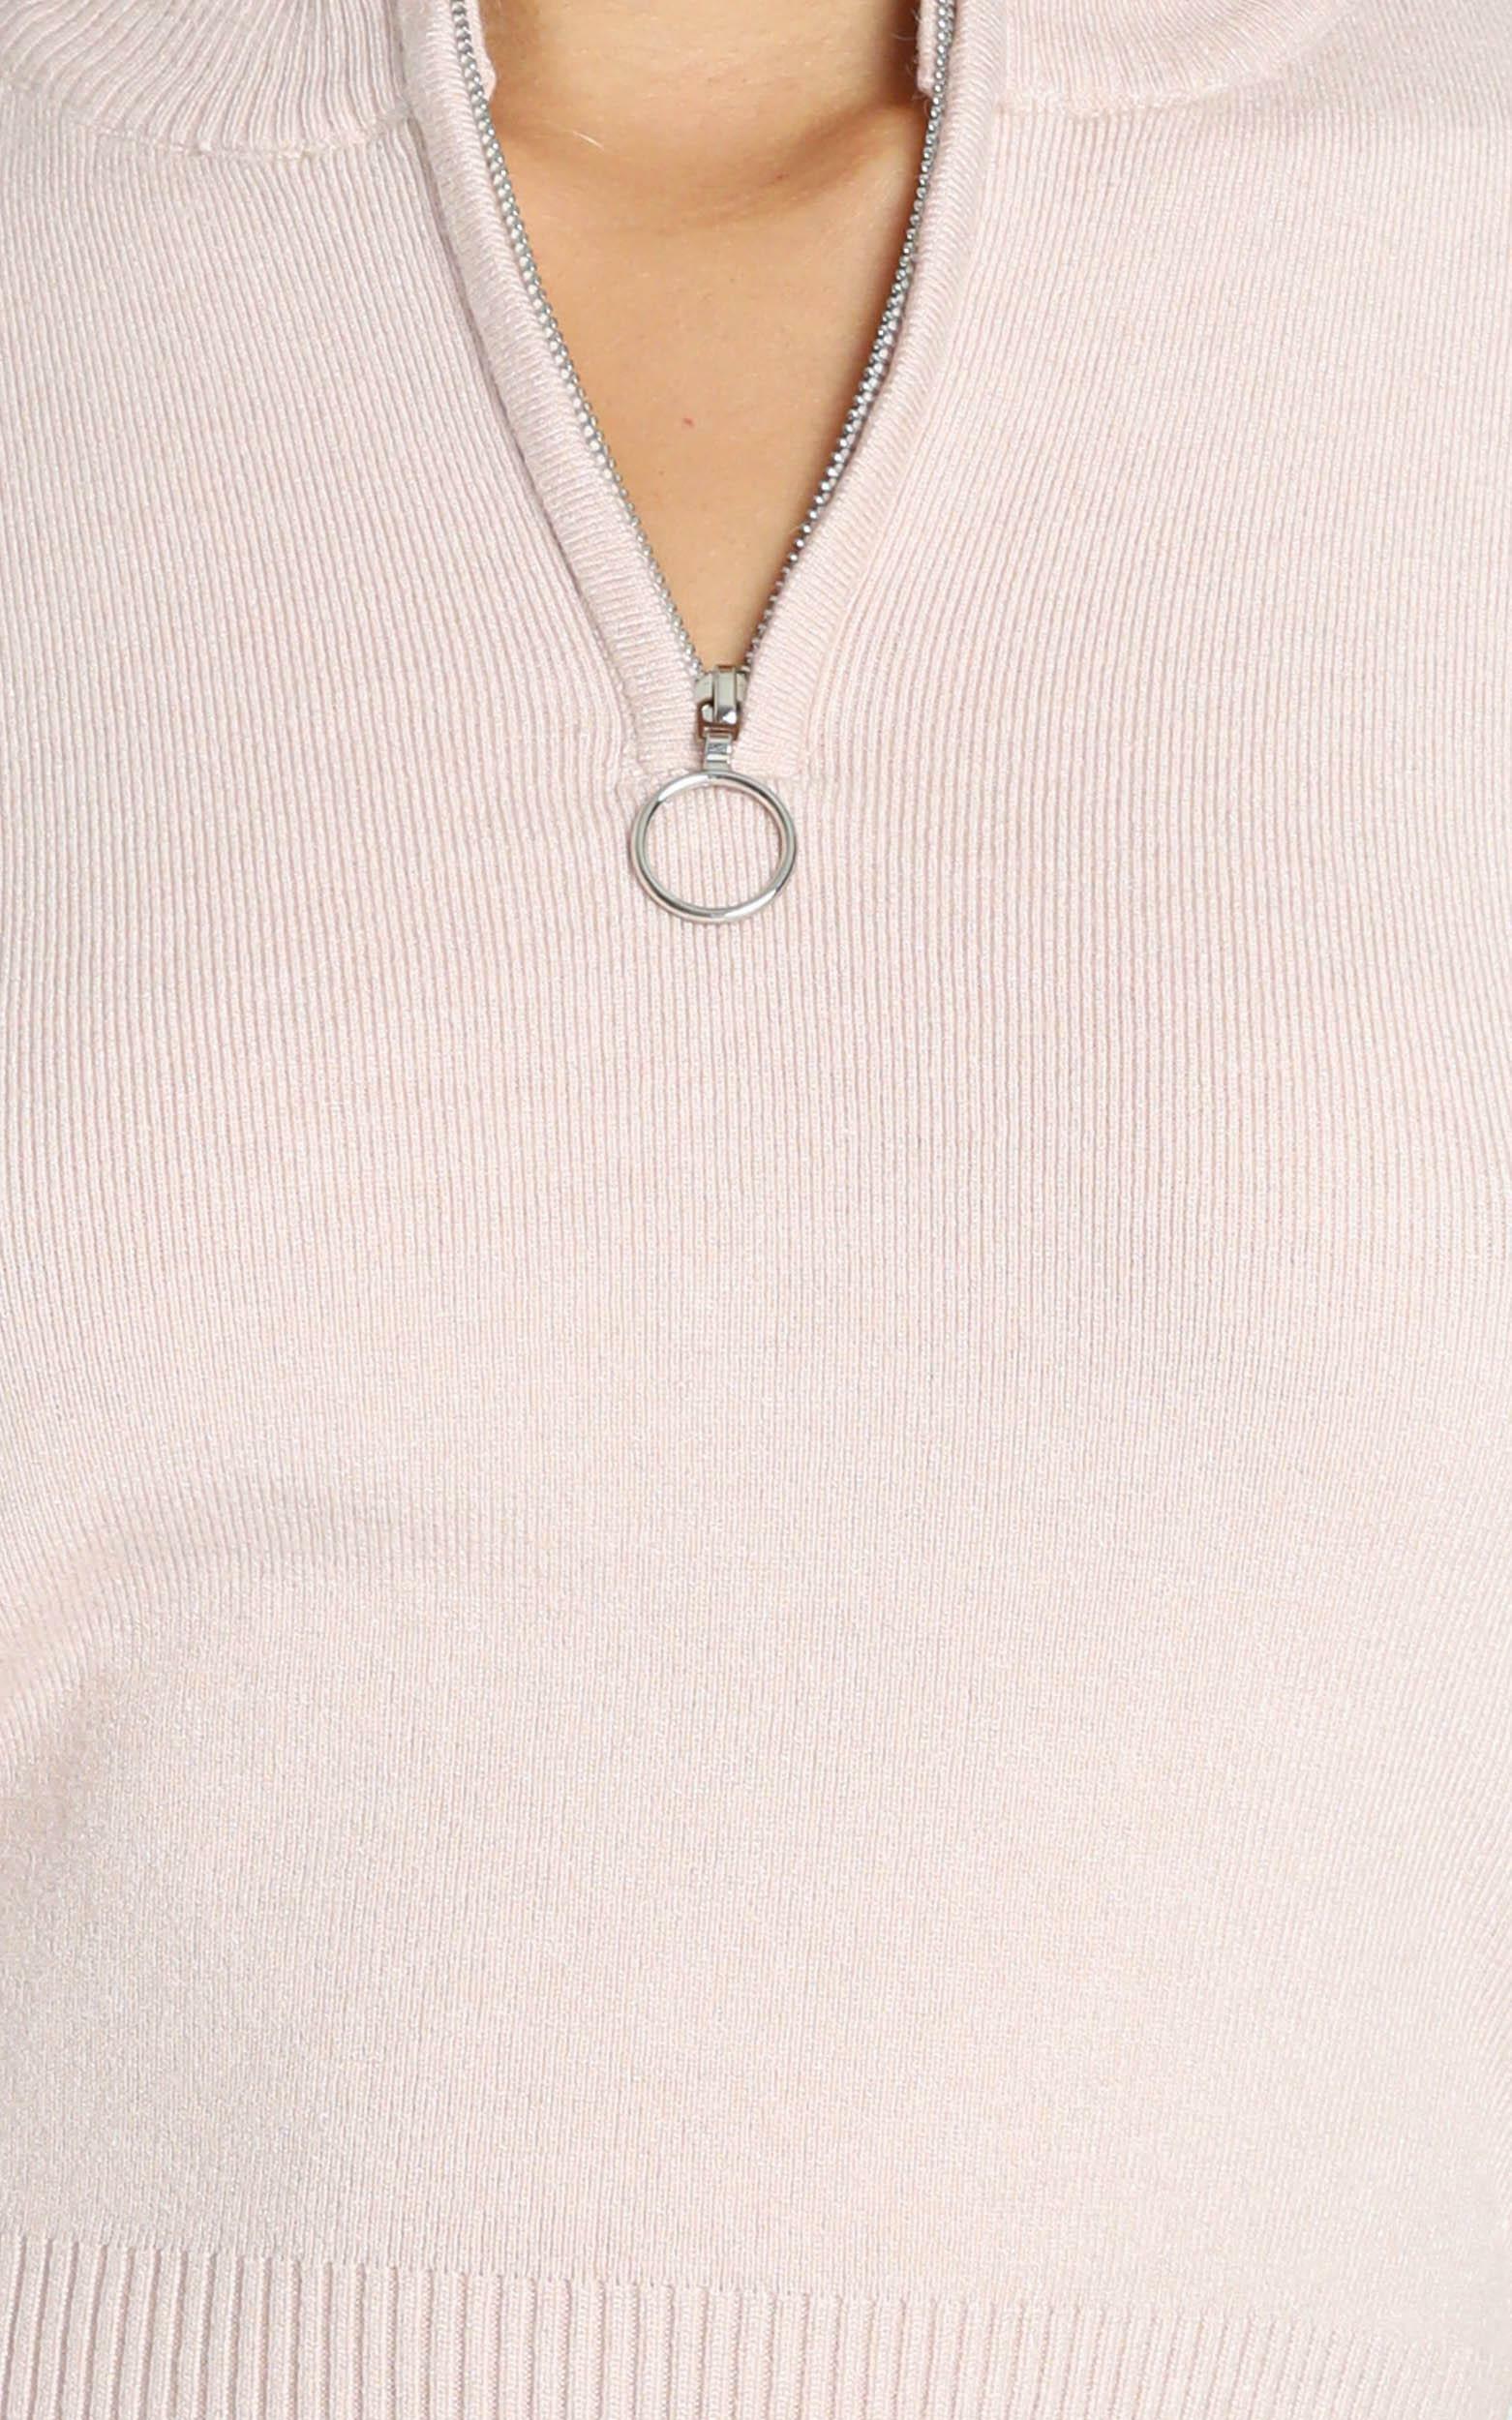 Izzy Knit Top in Beige - XS/S, Beige, hi-res image number null